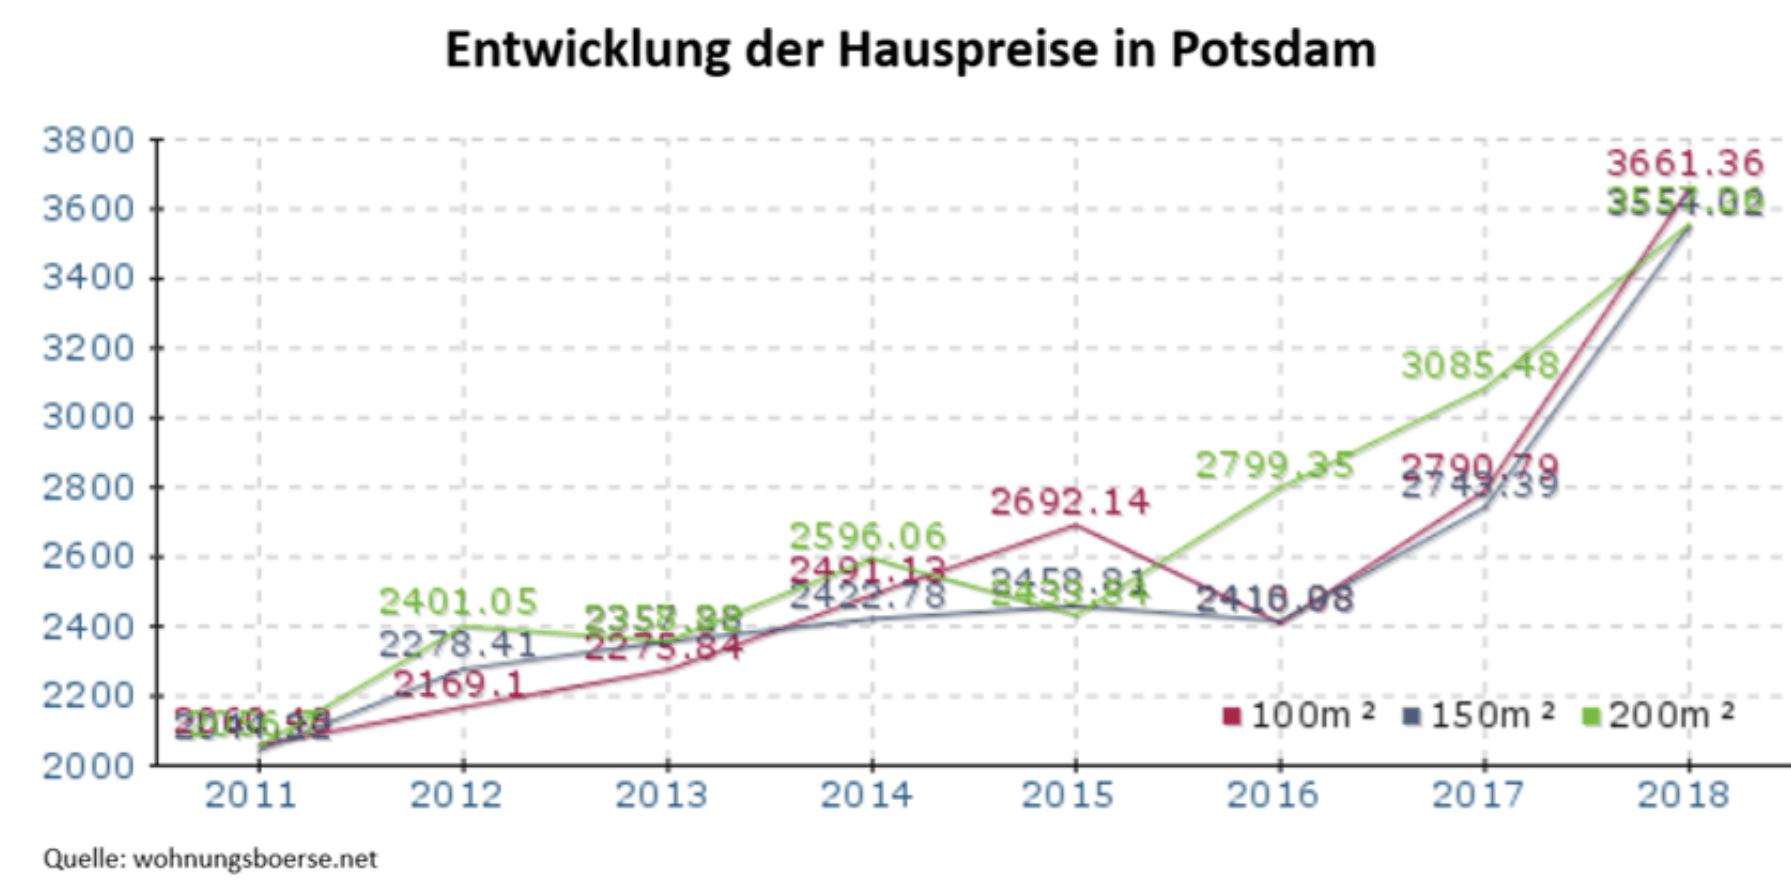 Immobilien Preise in Potsdam